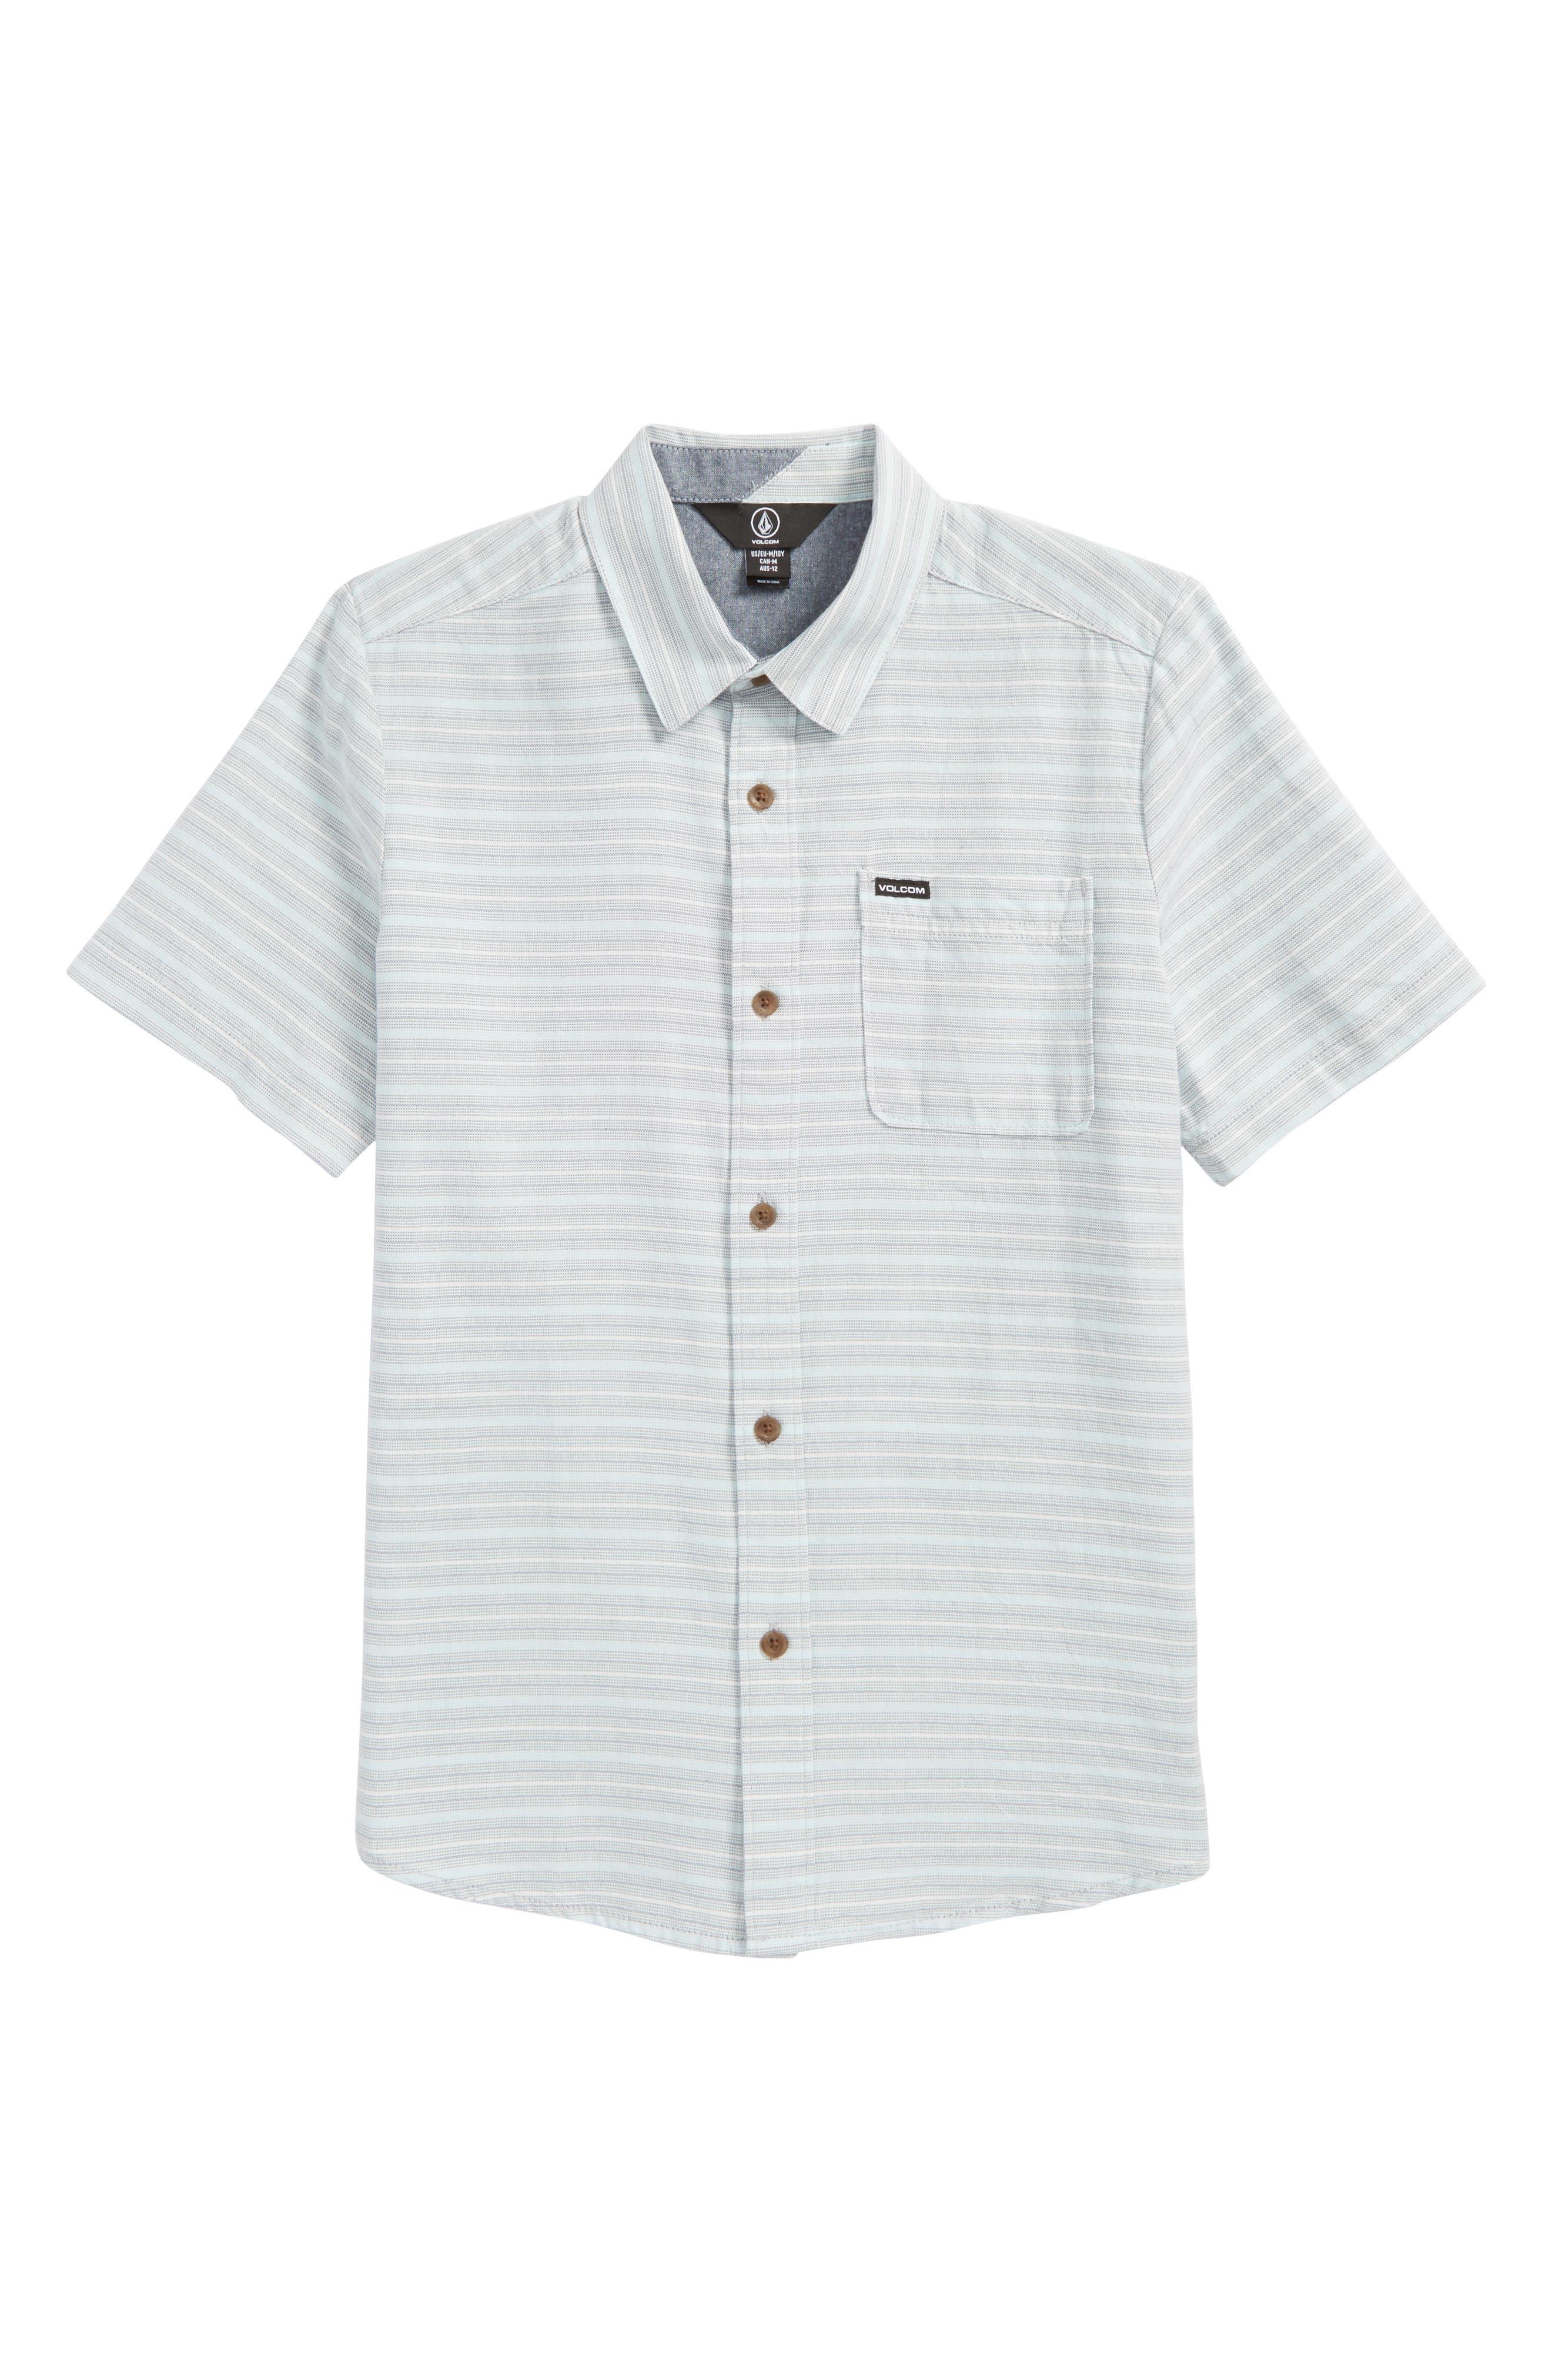 Main Image - Volcom Eastport Basket Weave Shirt (Big Boys)